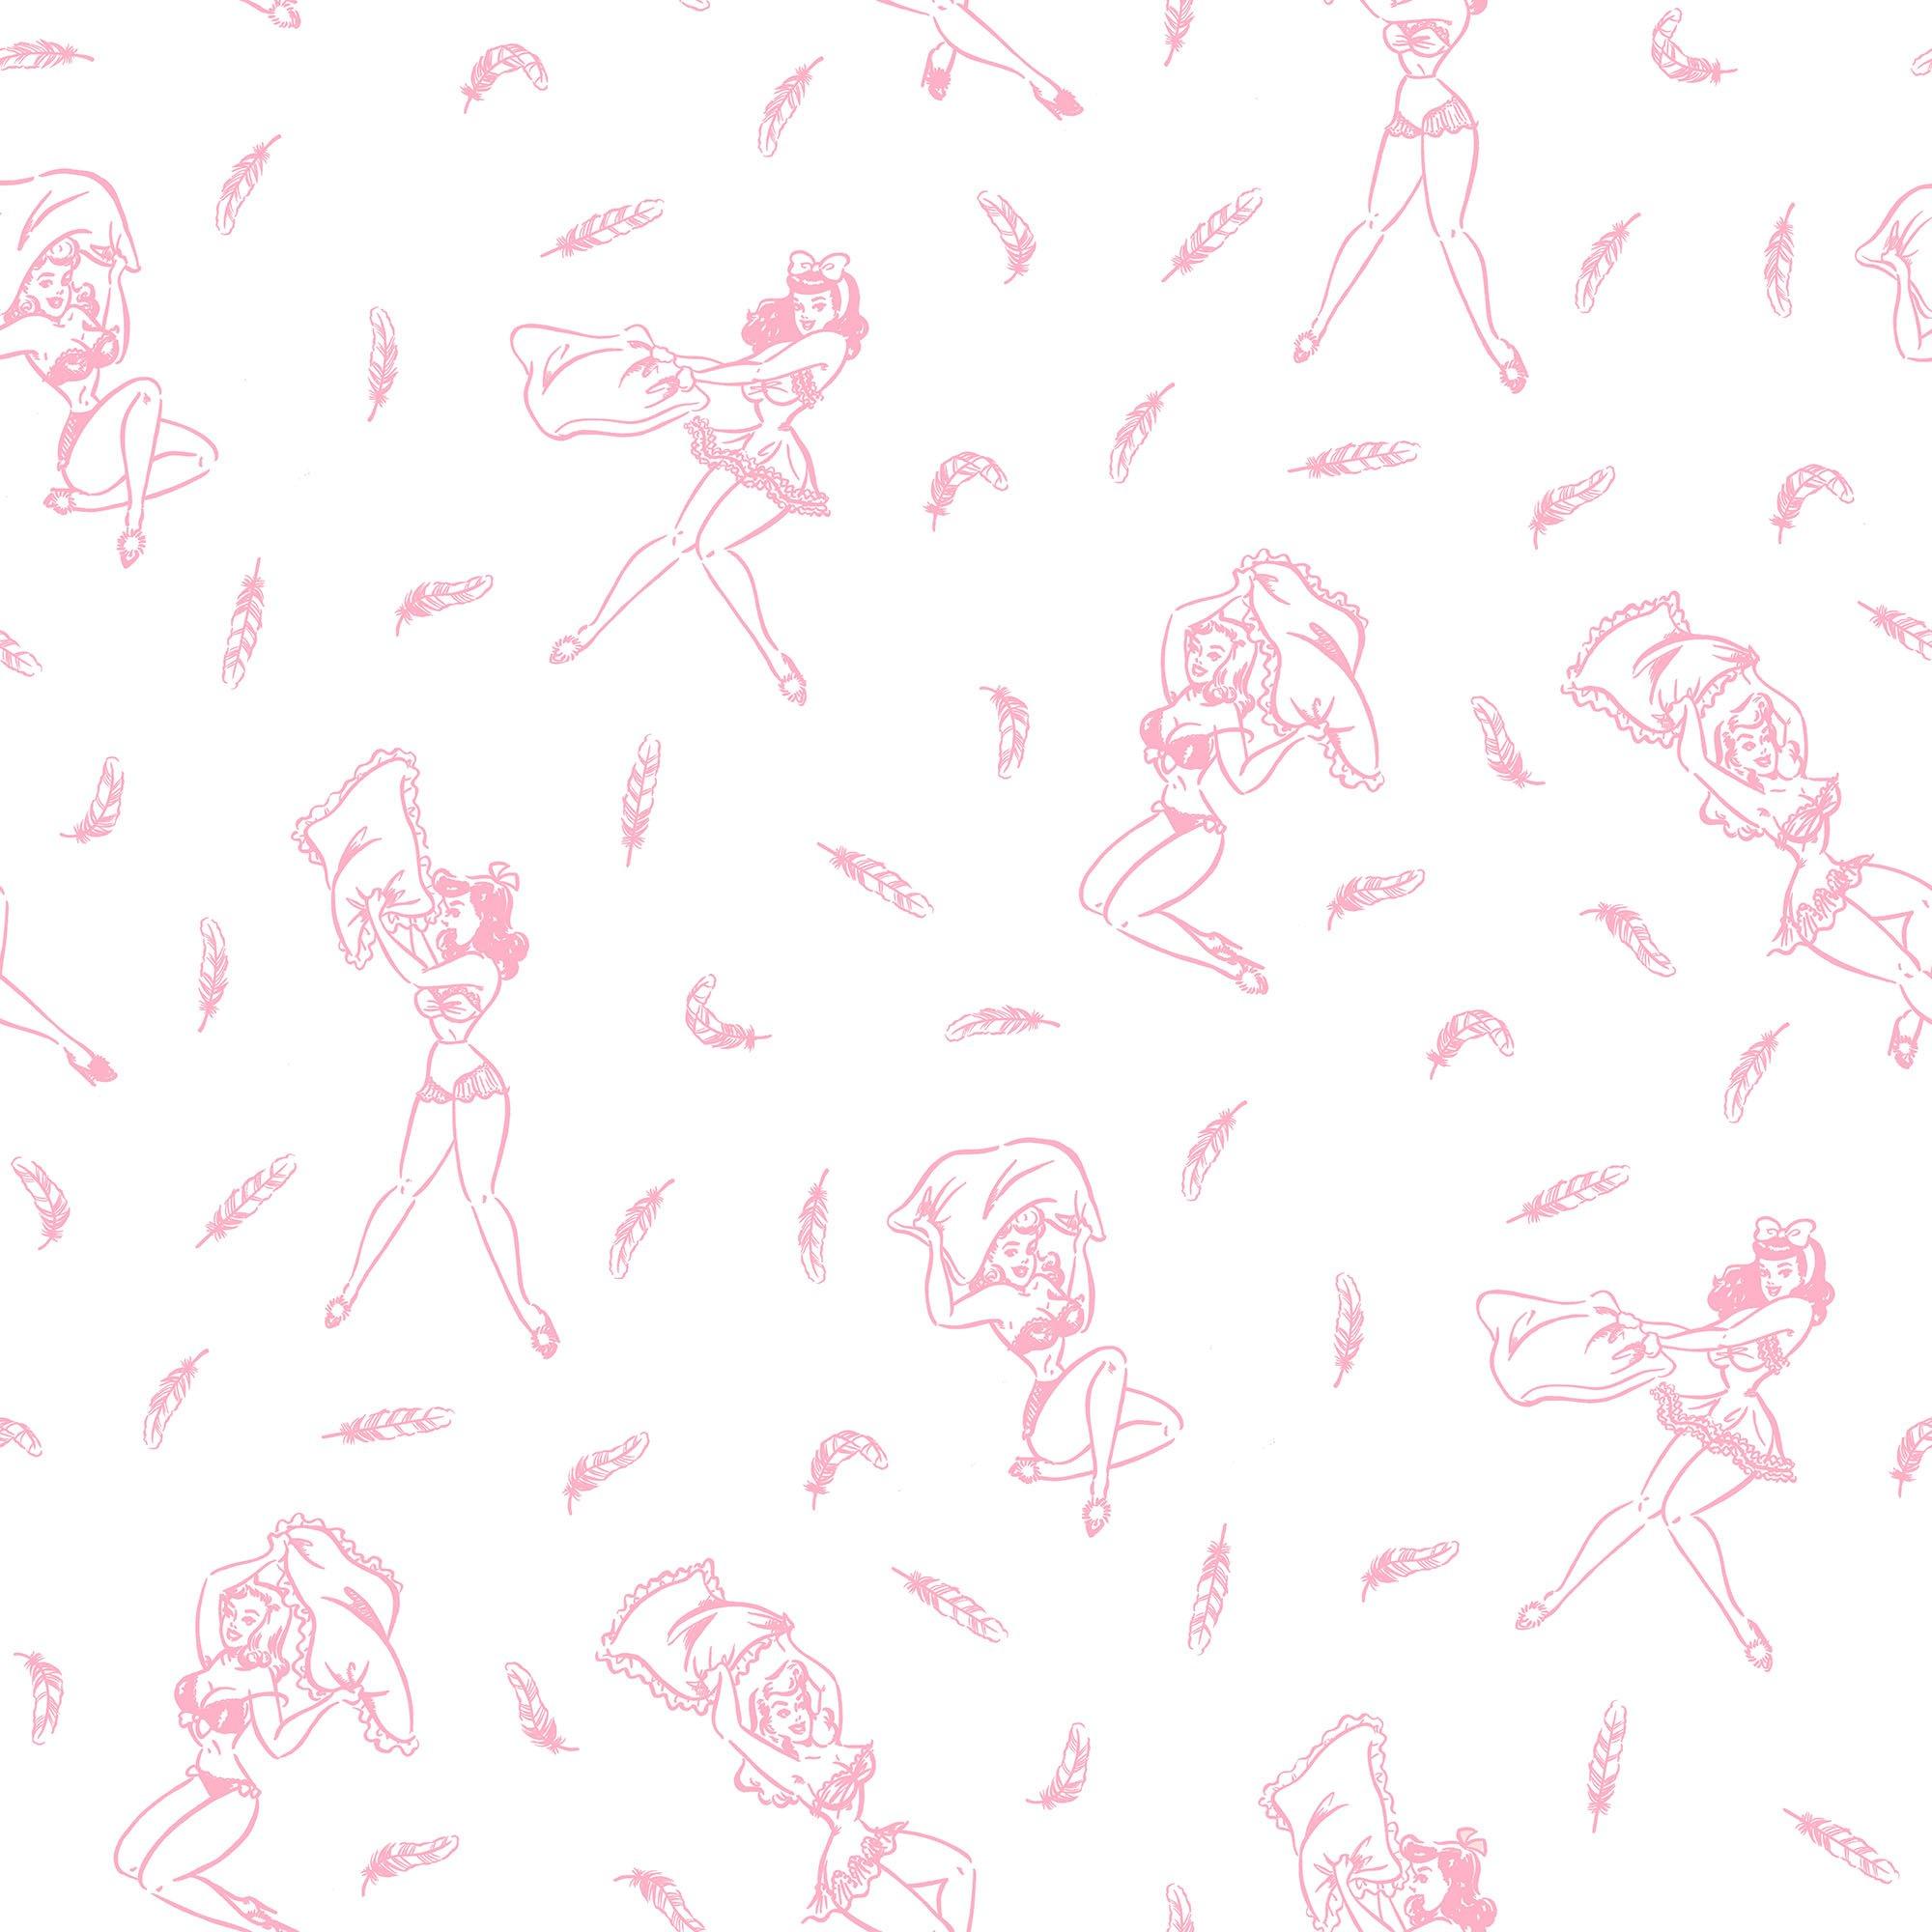 Pink Pin-Up Girls Comforter, Soft Cotton Bedding (Full/Queen)